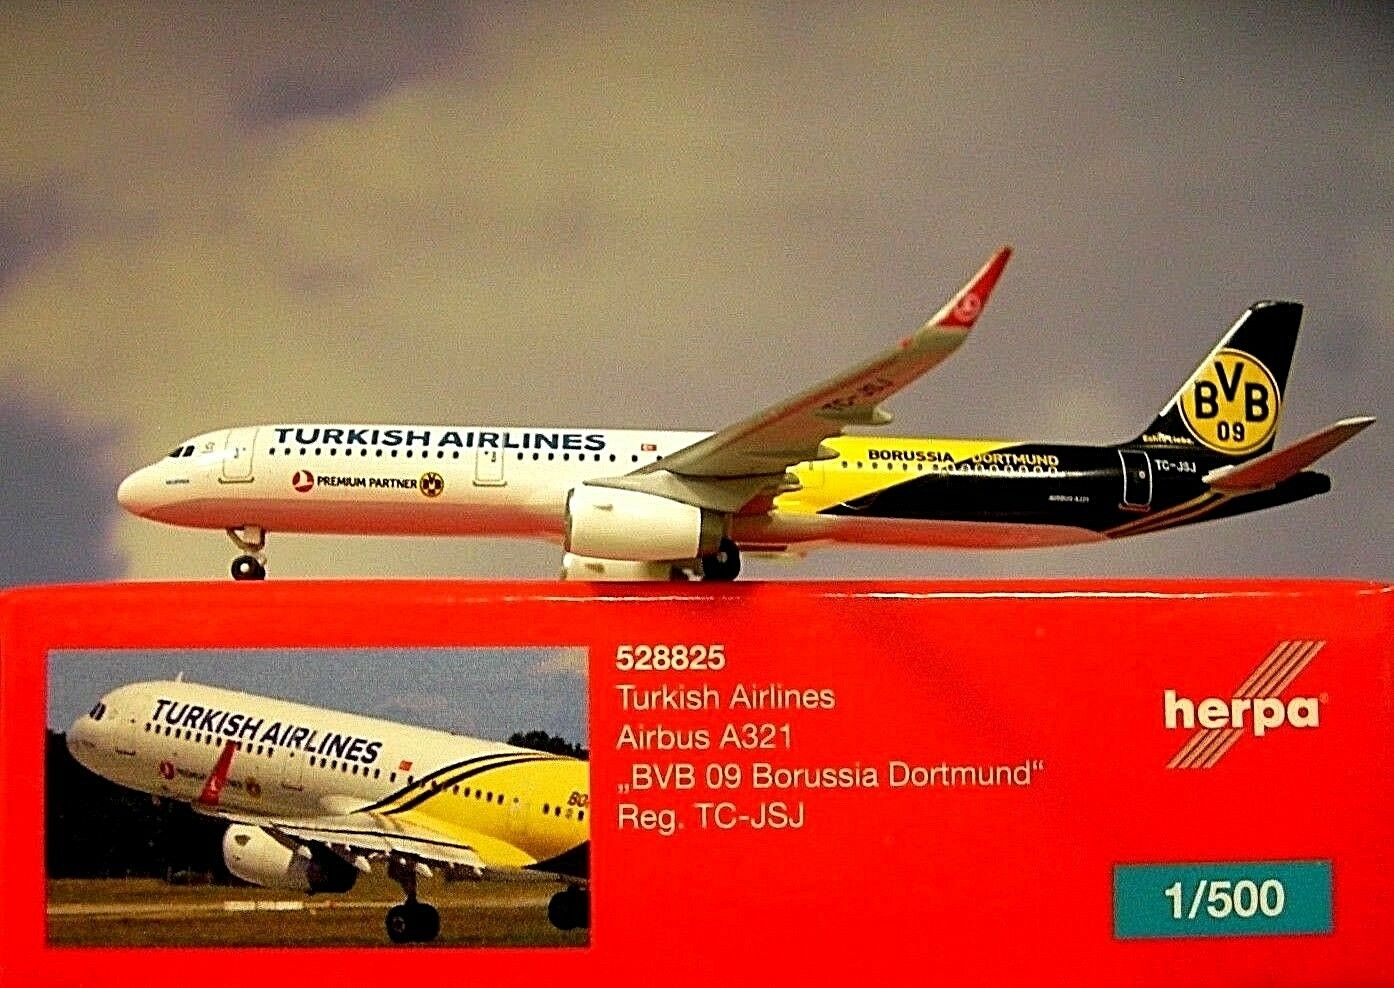 Herpa Herpa Herpa Ali 1 500 Airbus A321 Turkish Airlines Bvb 09 528825 Modellairport500 44c6c4